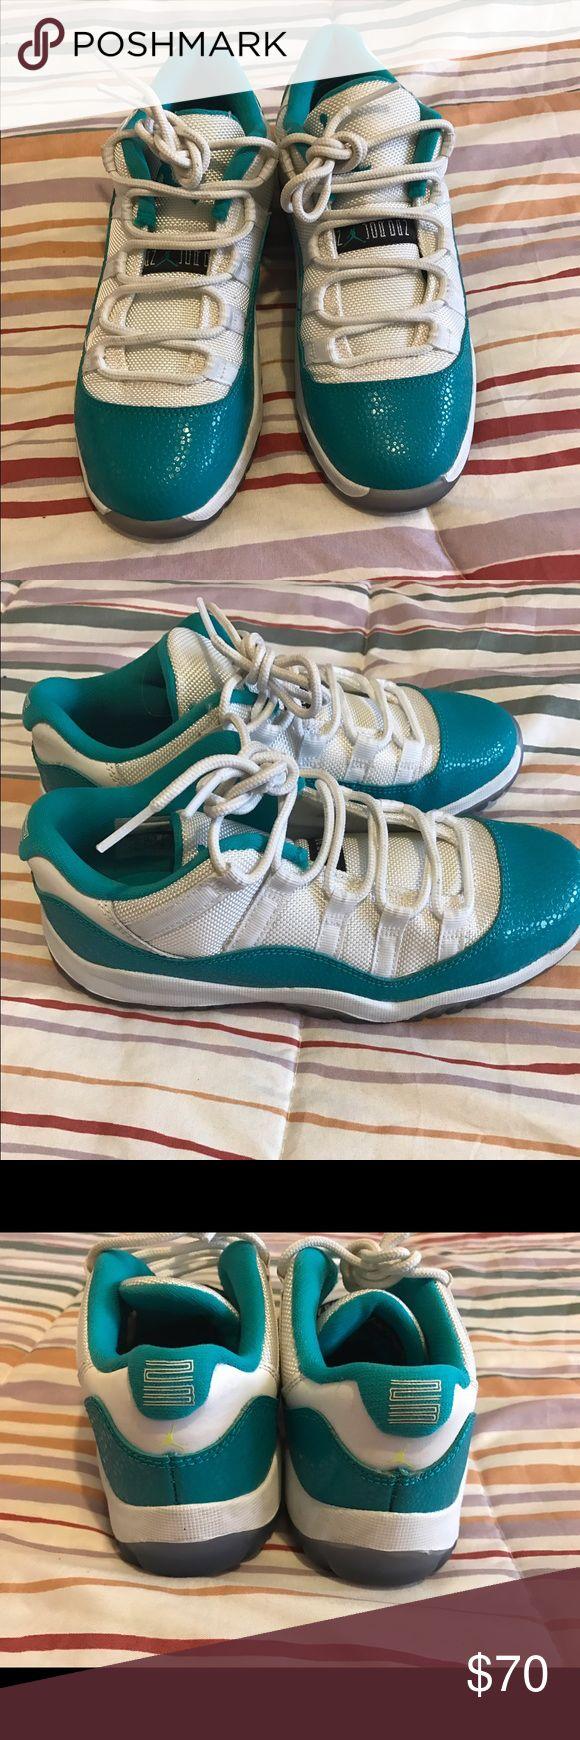 Aqua Jordan Low 11s Size 2 Used only twice. No box. Size 2 Jordan Shoes Sneakers